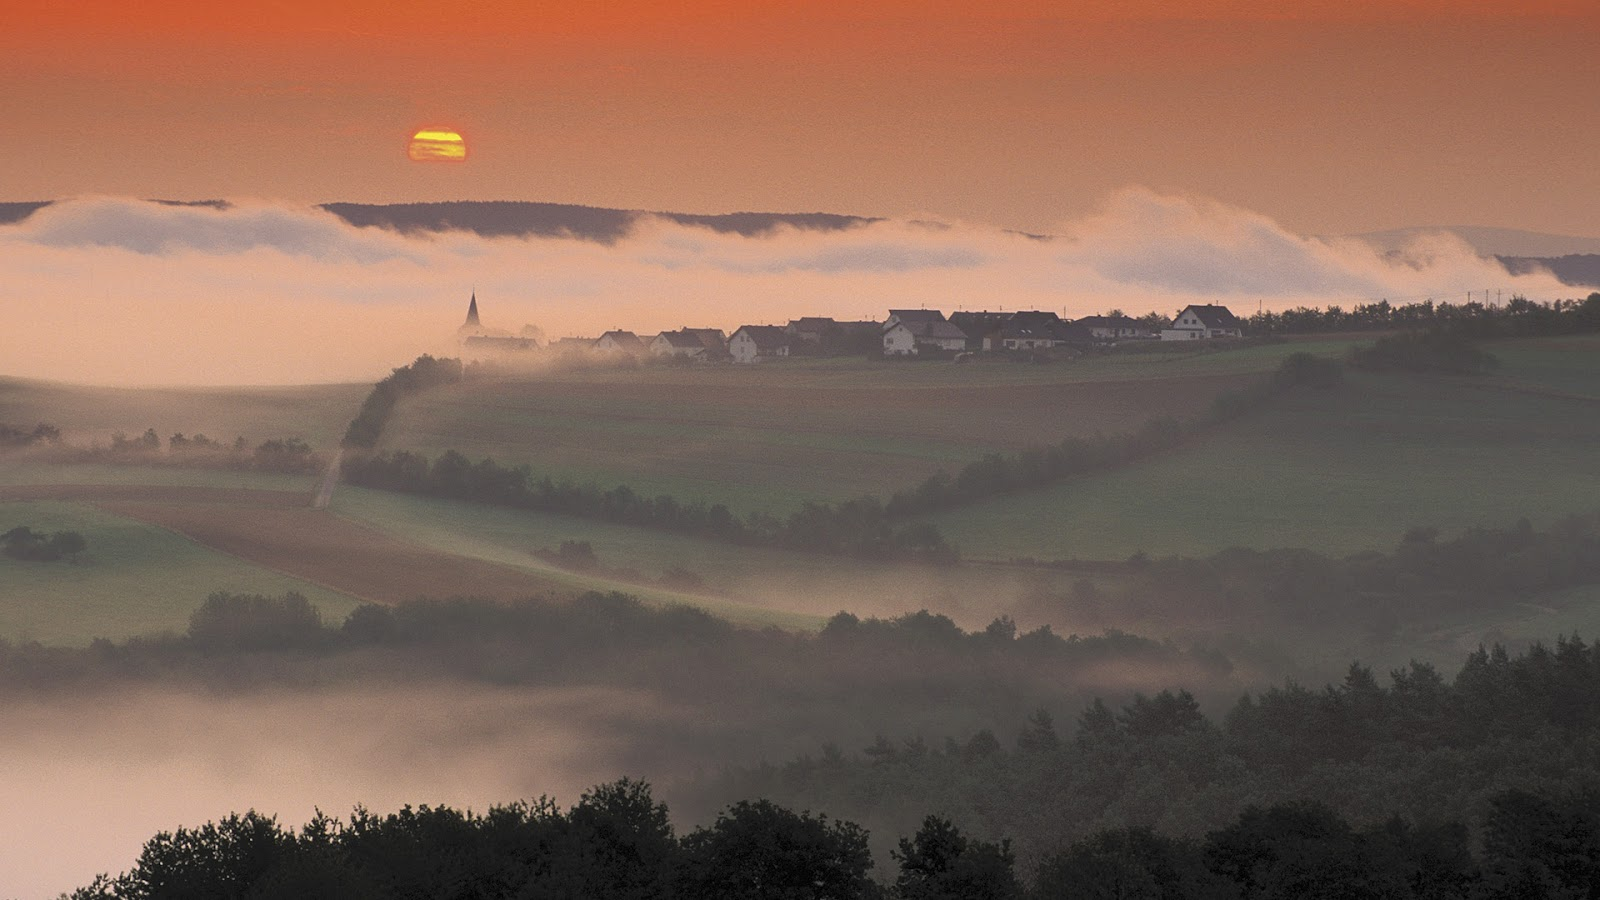 http://3.bp.blogspot.com/-hMD6_frhVE0/UA1c2Fb_HoI/AAAAAAAAAdA/DCbs4qfH2QA/s1600/Foggy+Village+at+Sunrise.jpg